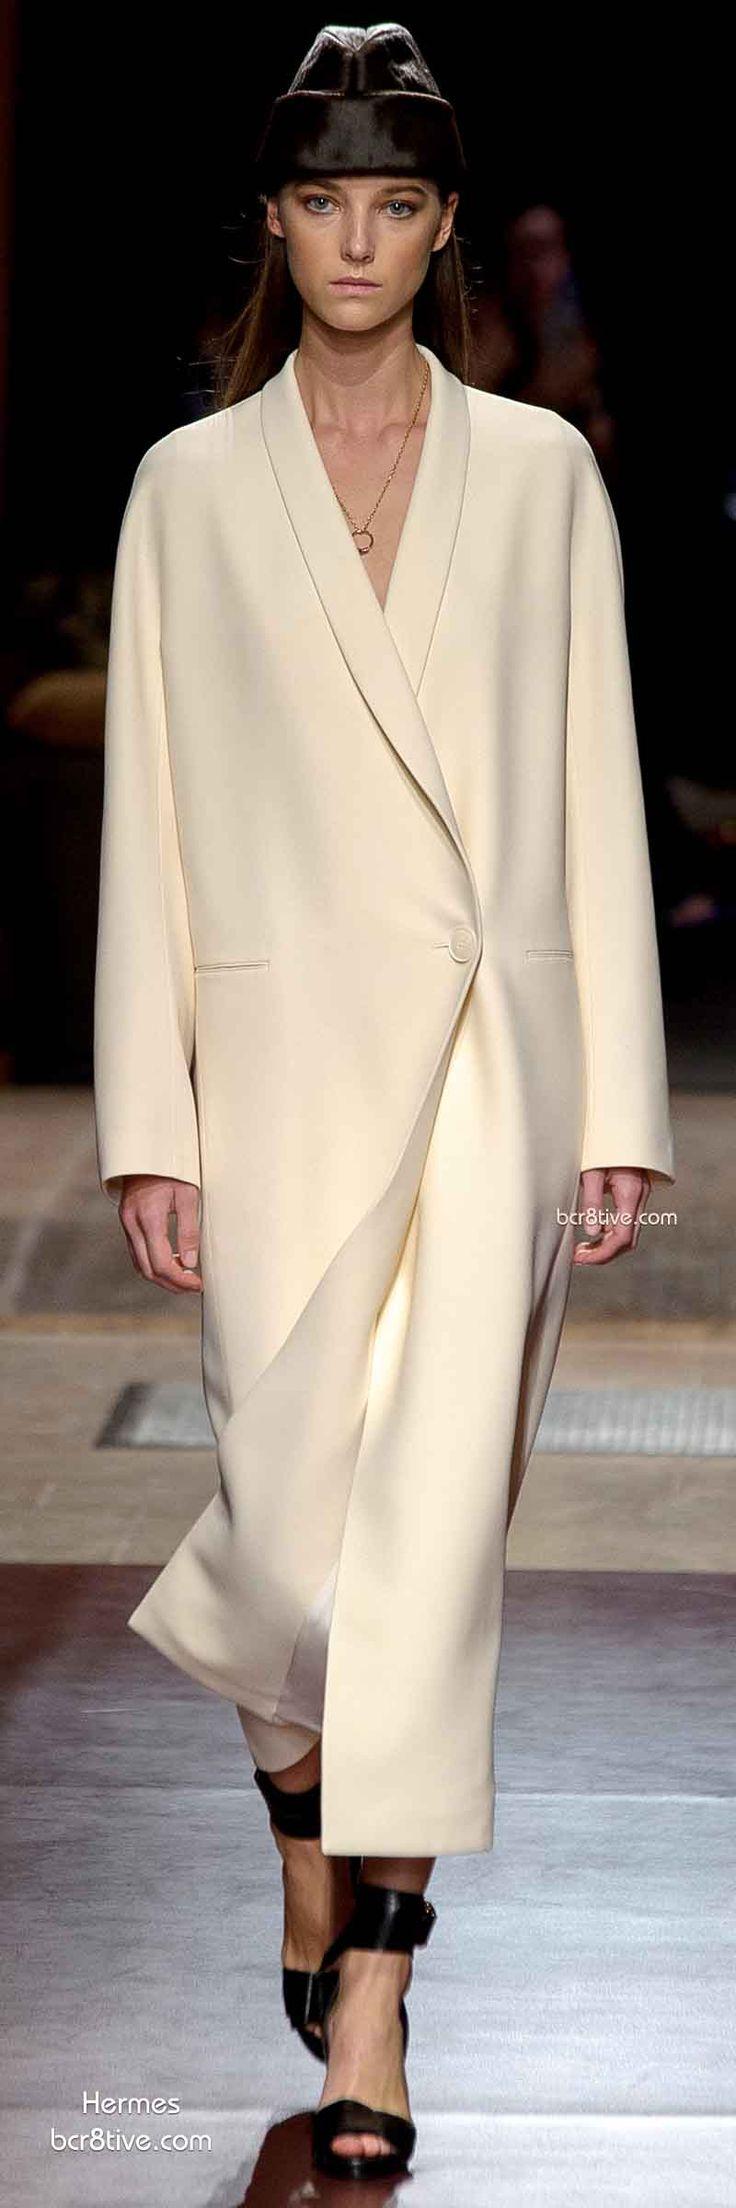 Fall 2014 Menswear Inspired Fashion - Hermes